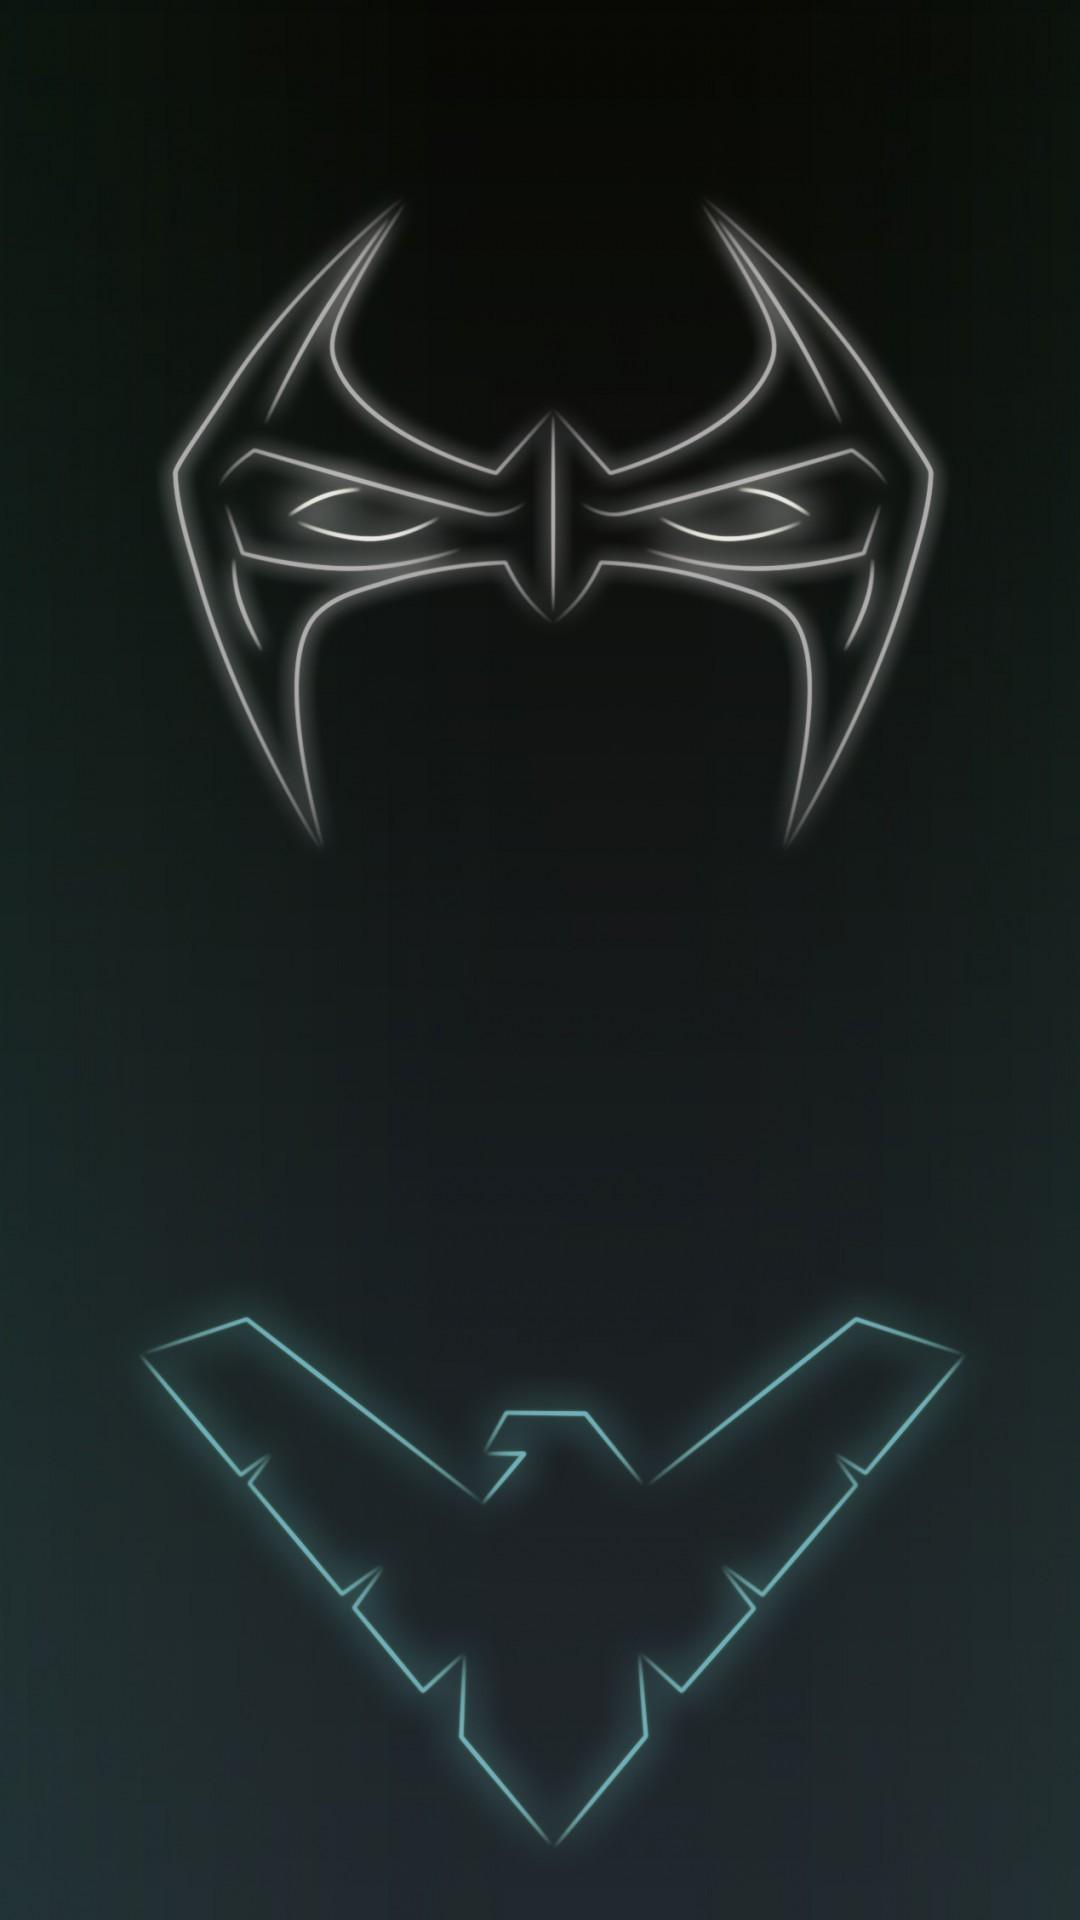 neon logo superhero neon lights light wing Trident symbol emblem graphics computer wallpaper font 1080x1920 px